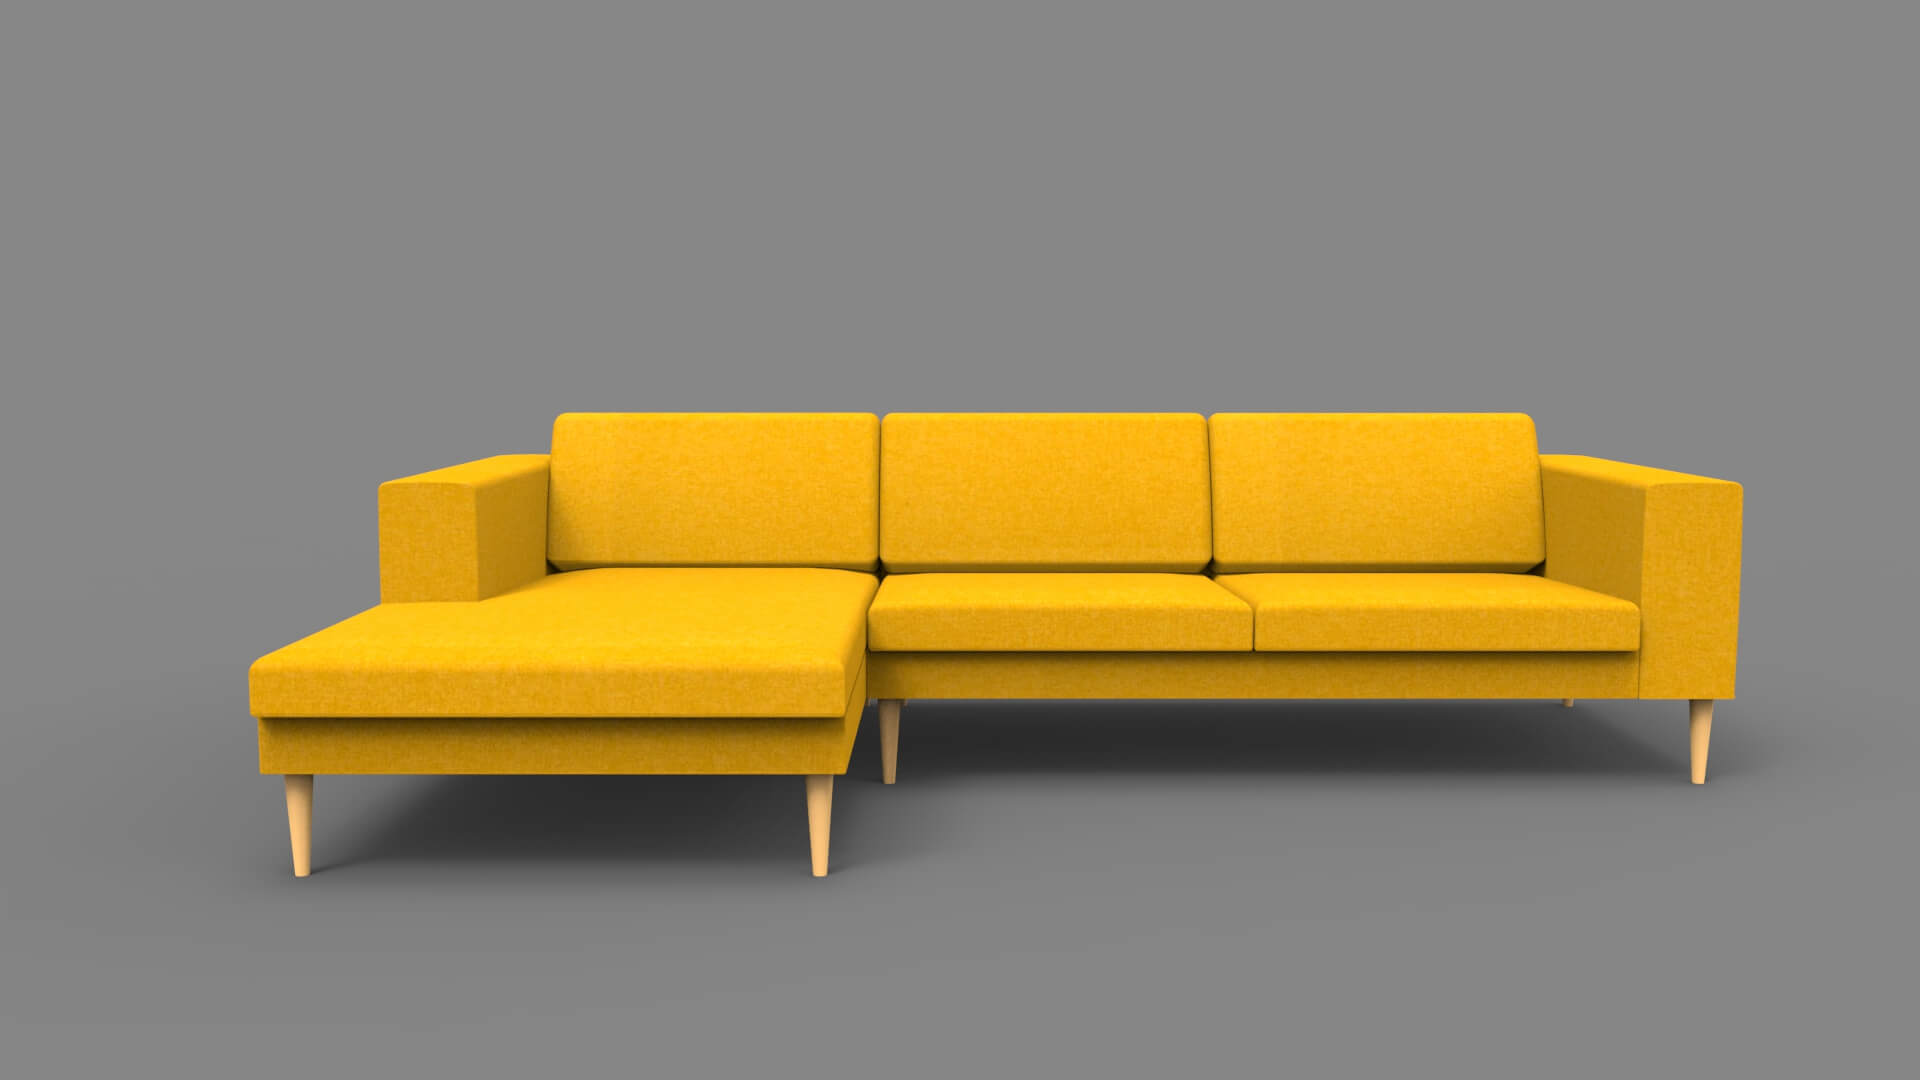 FREND-yellow-sofa